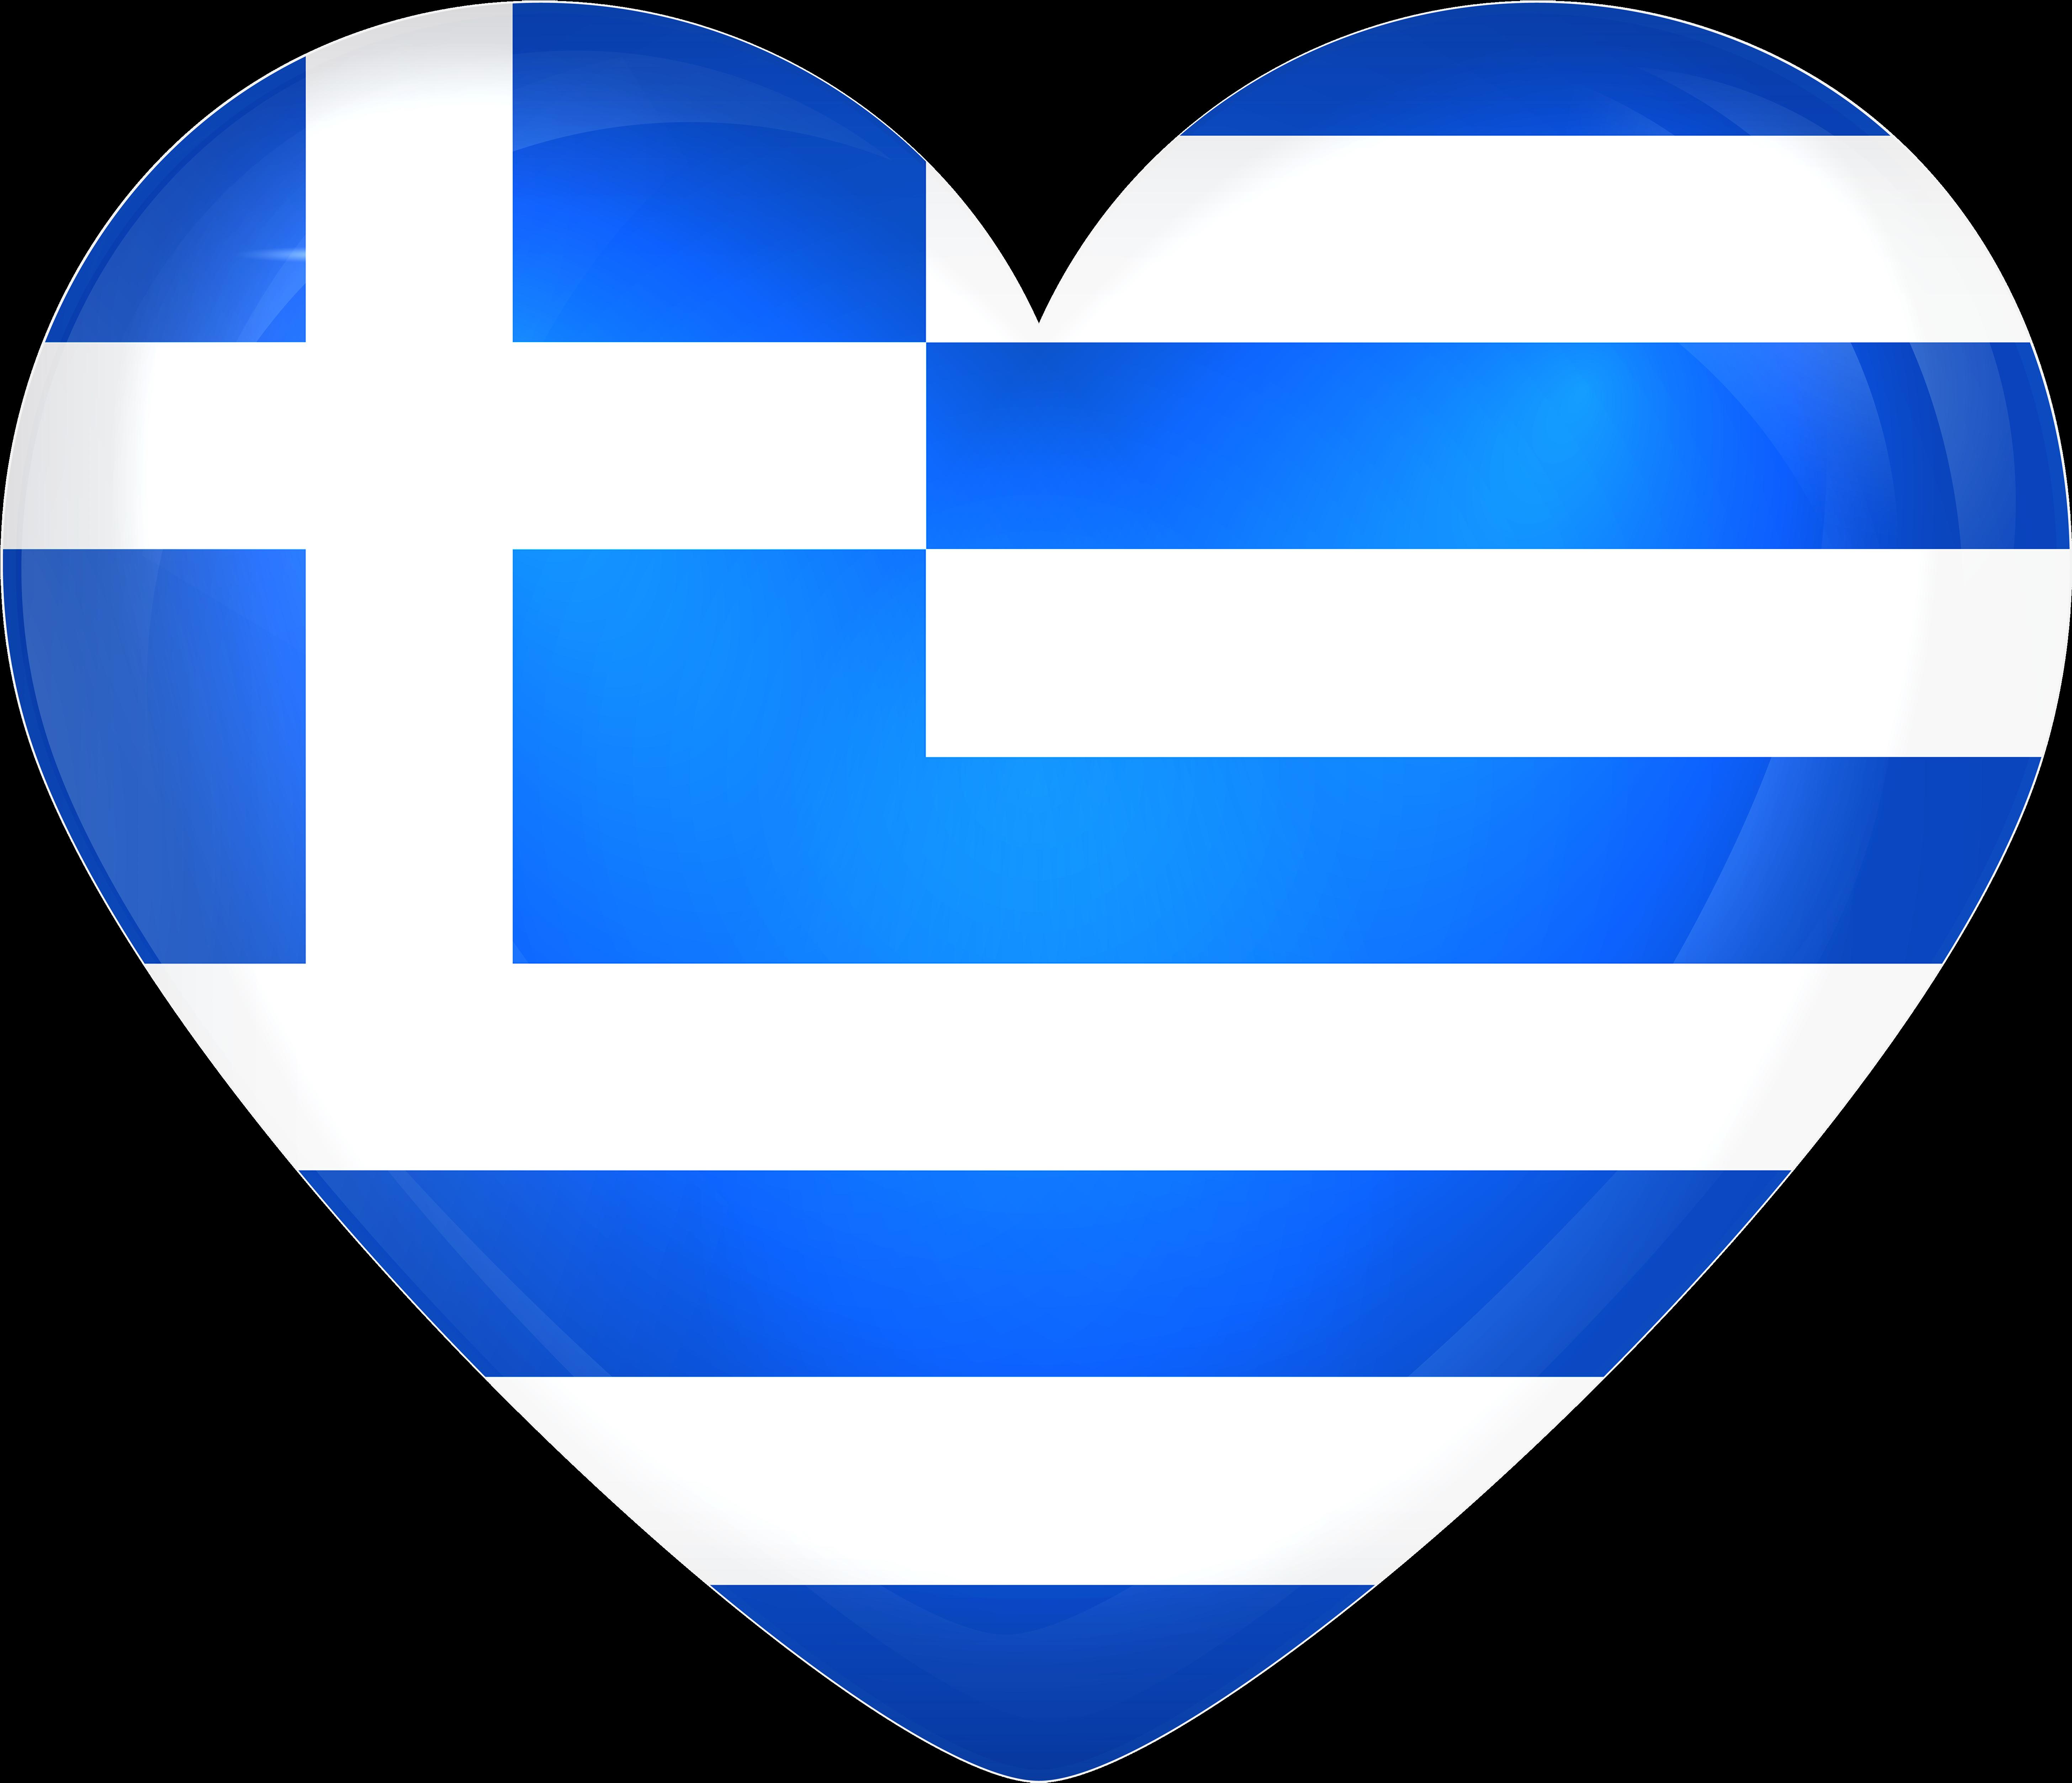 Greece Large Heart Flag Gallery Yopriceville High   Greece Flag ...